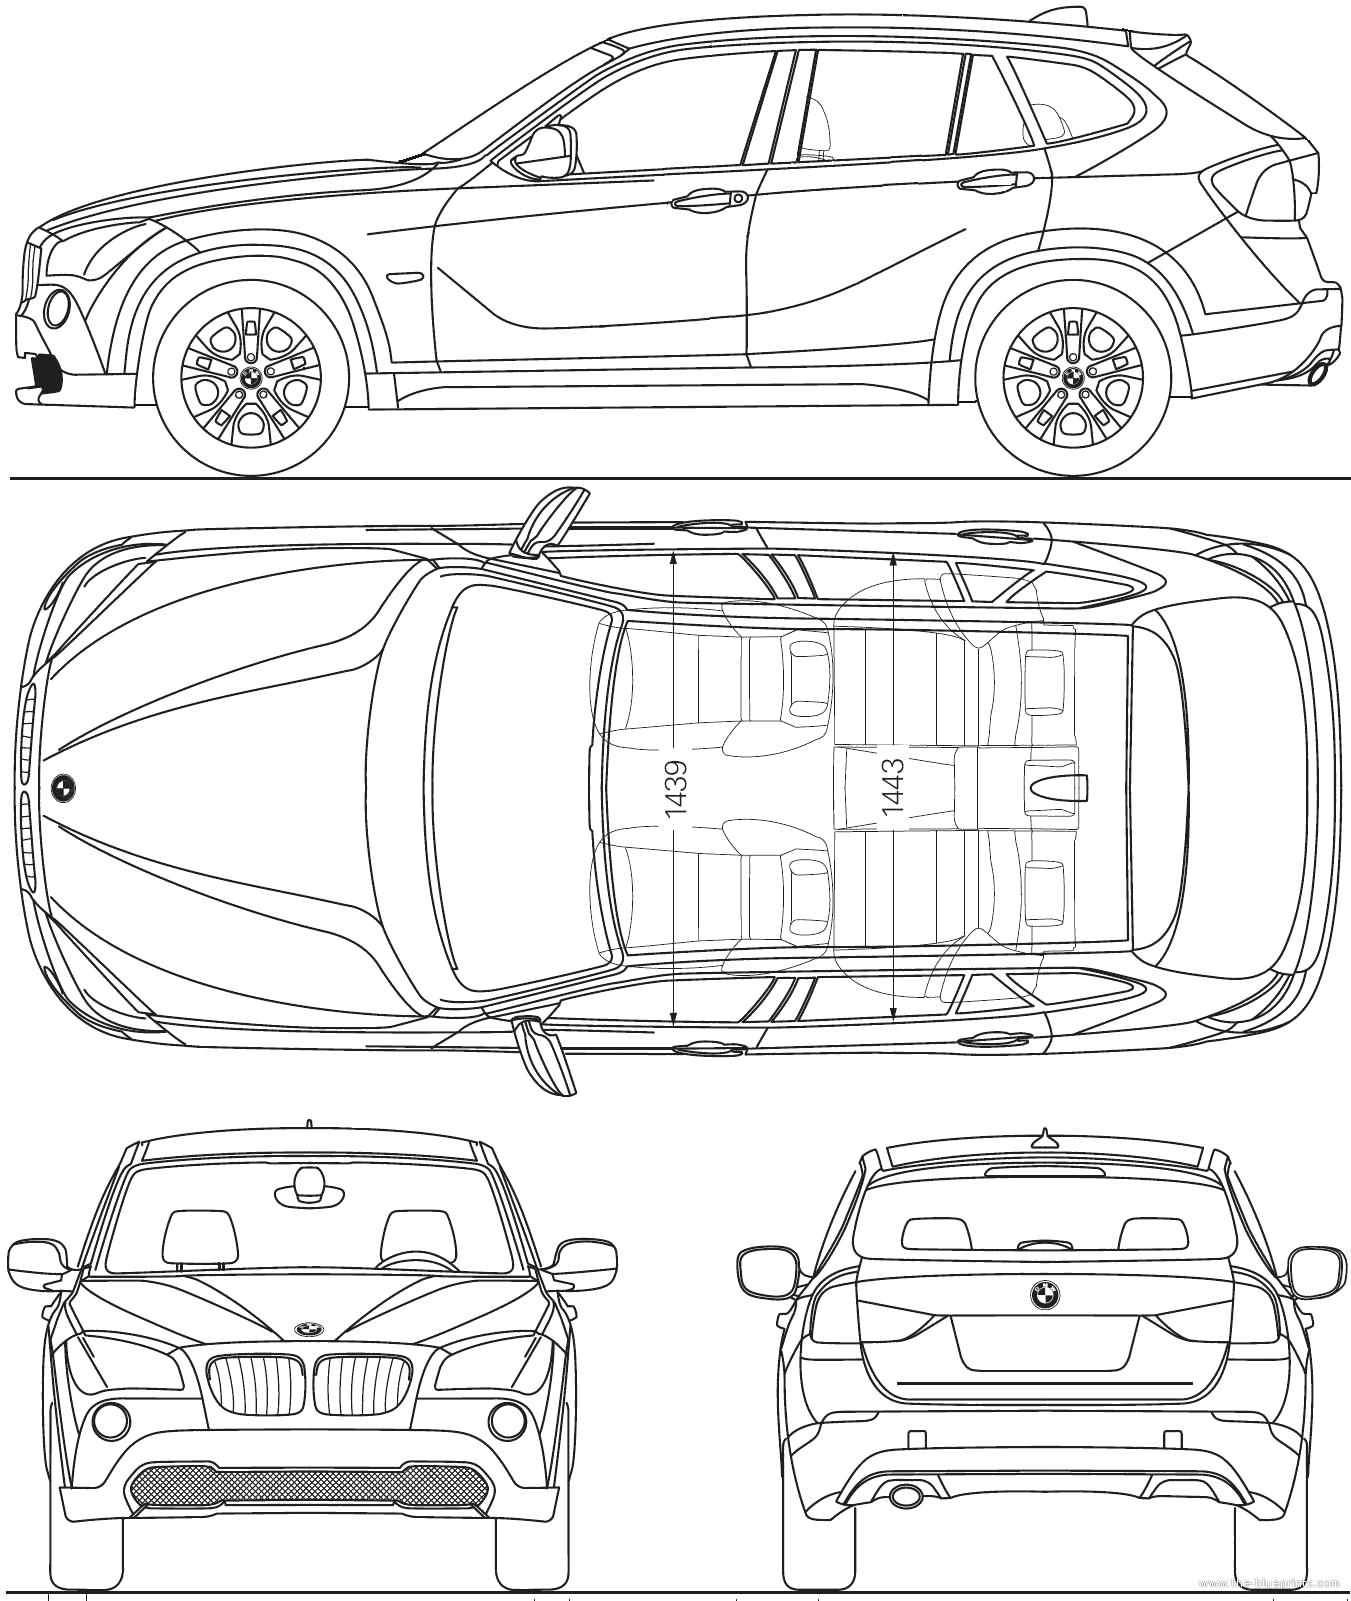 the blueprints cars bmw bmw x1 e84. Black Bedroom Furniture Sets. Home Design Ideas